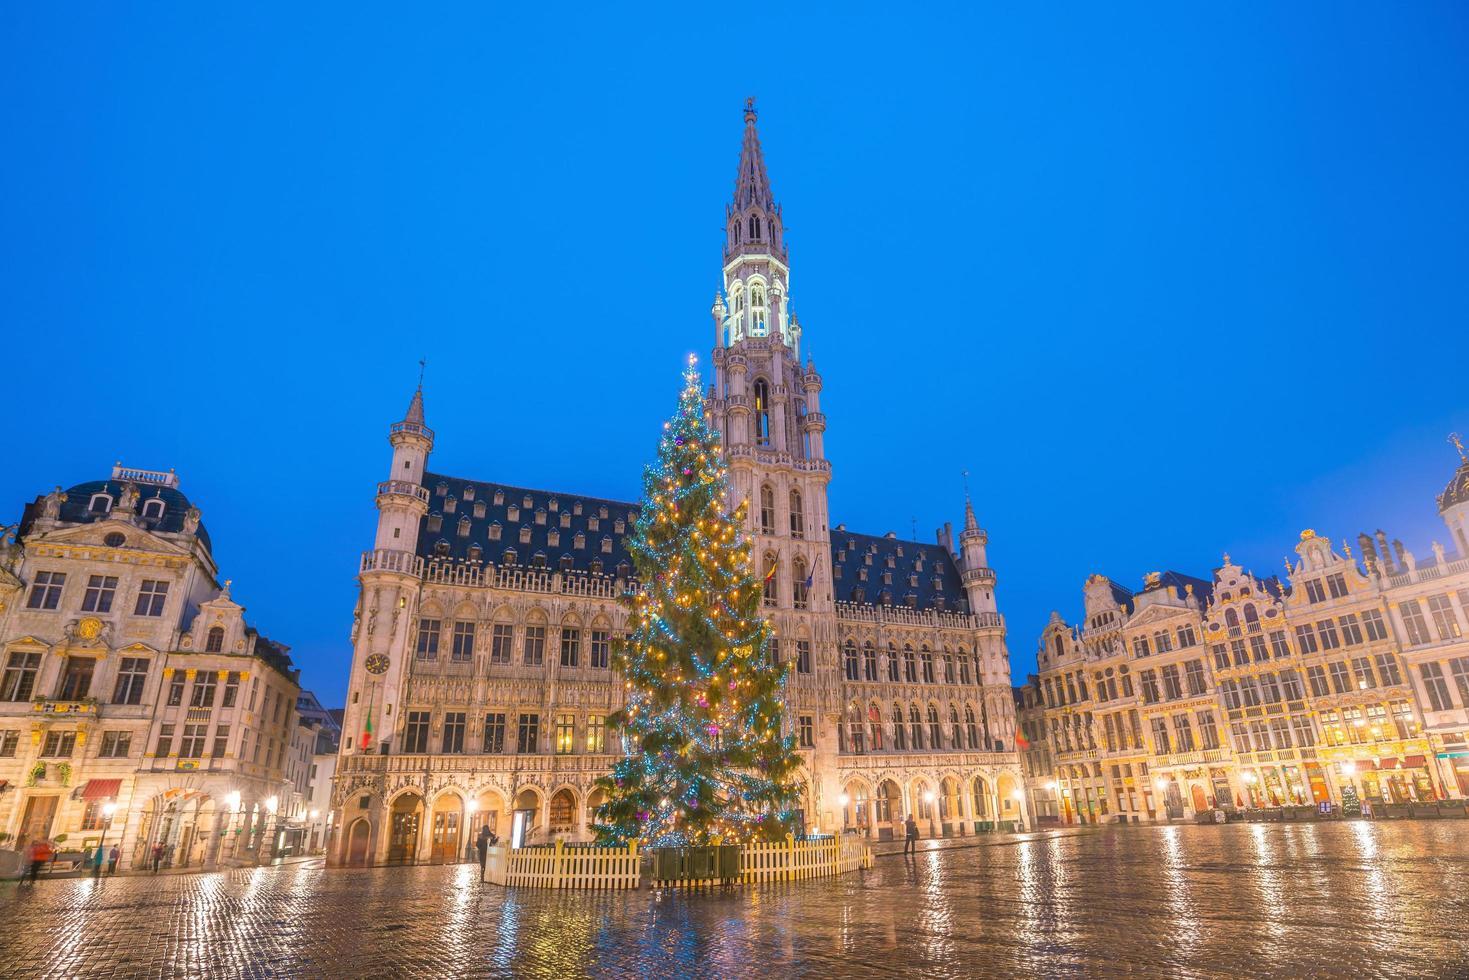 den stora platsen i gamla stan Bryssel, Belgien foto